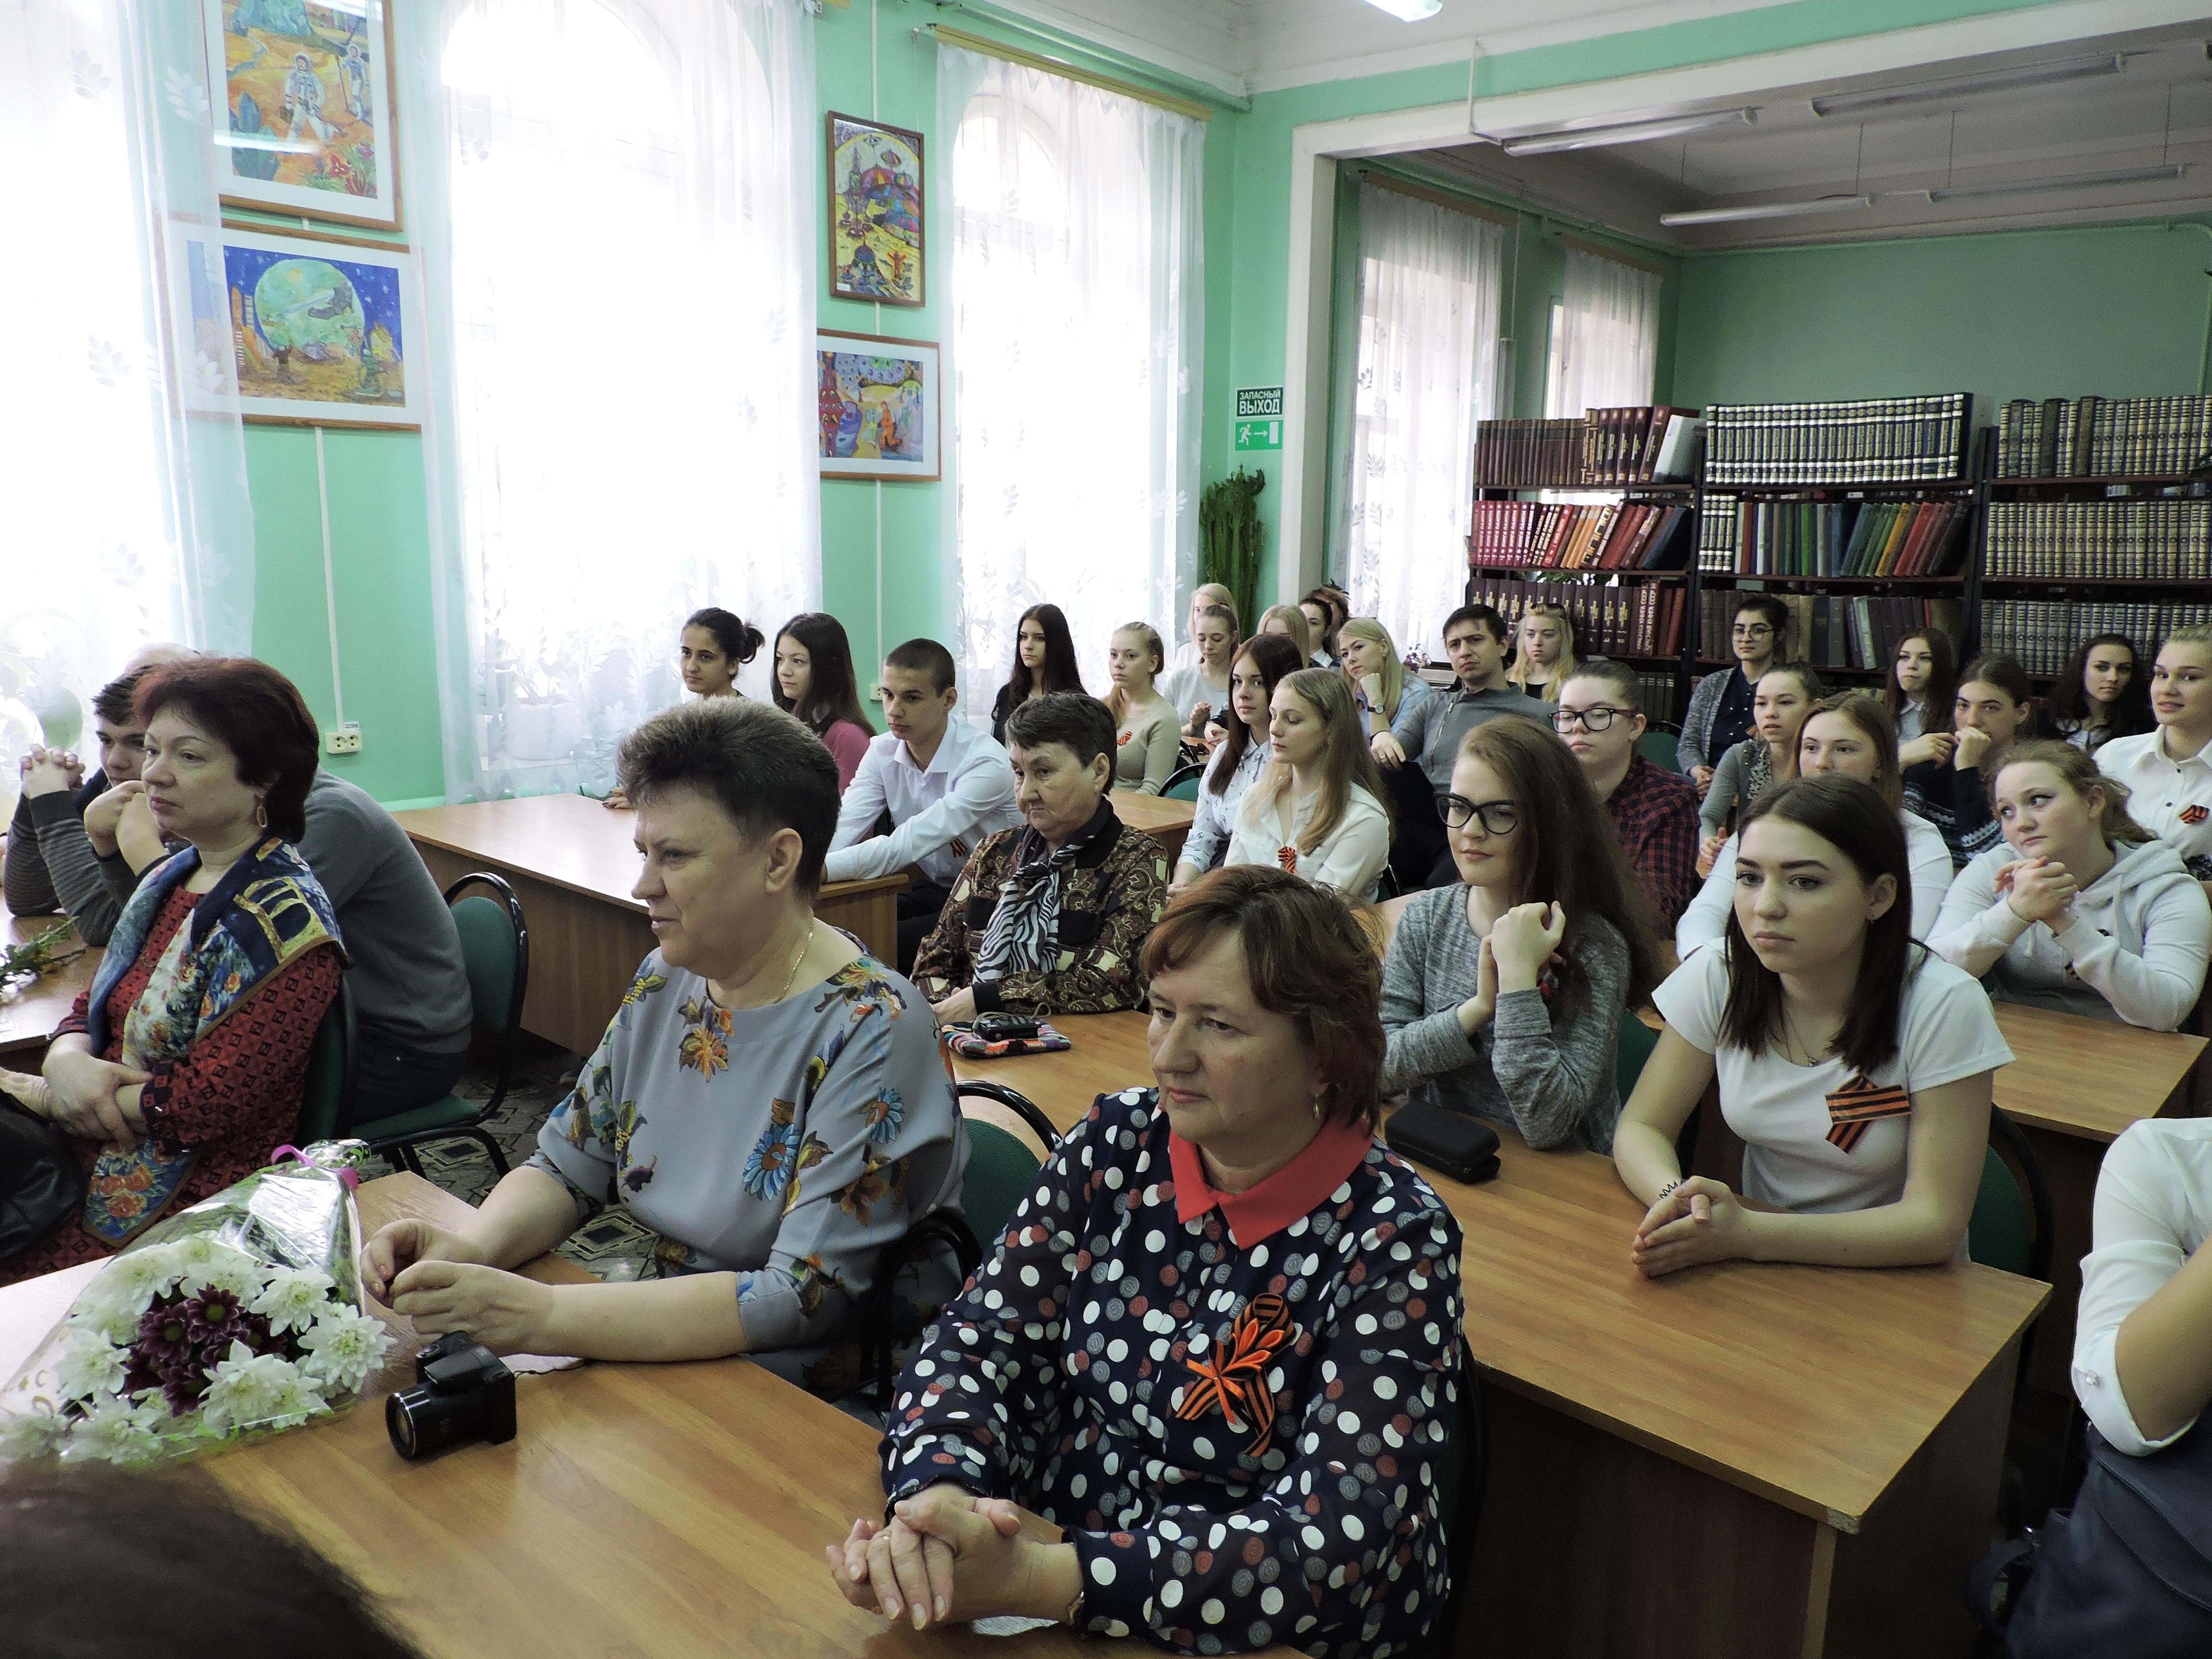 Новости россии таджикистан таможенный союз 2017